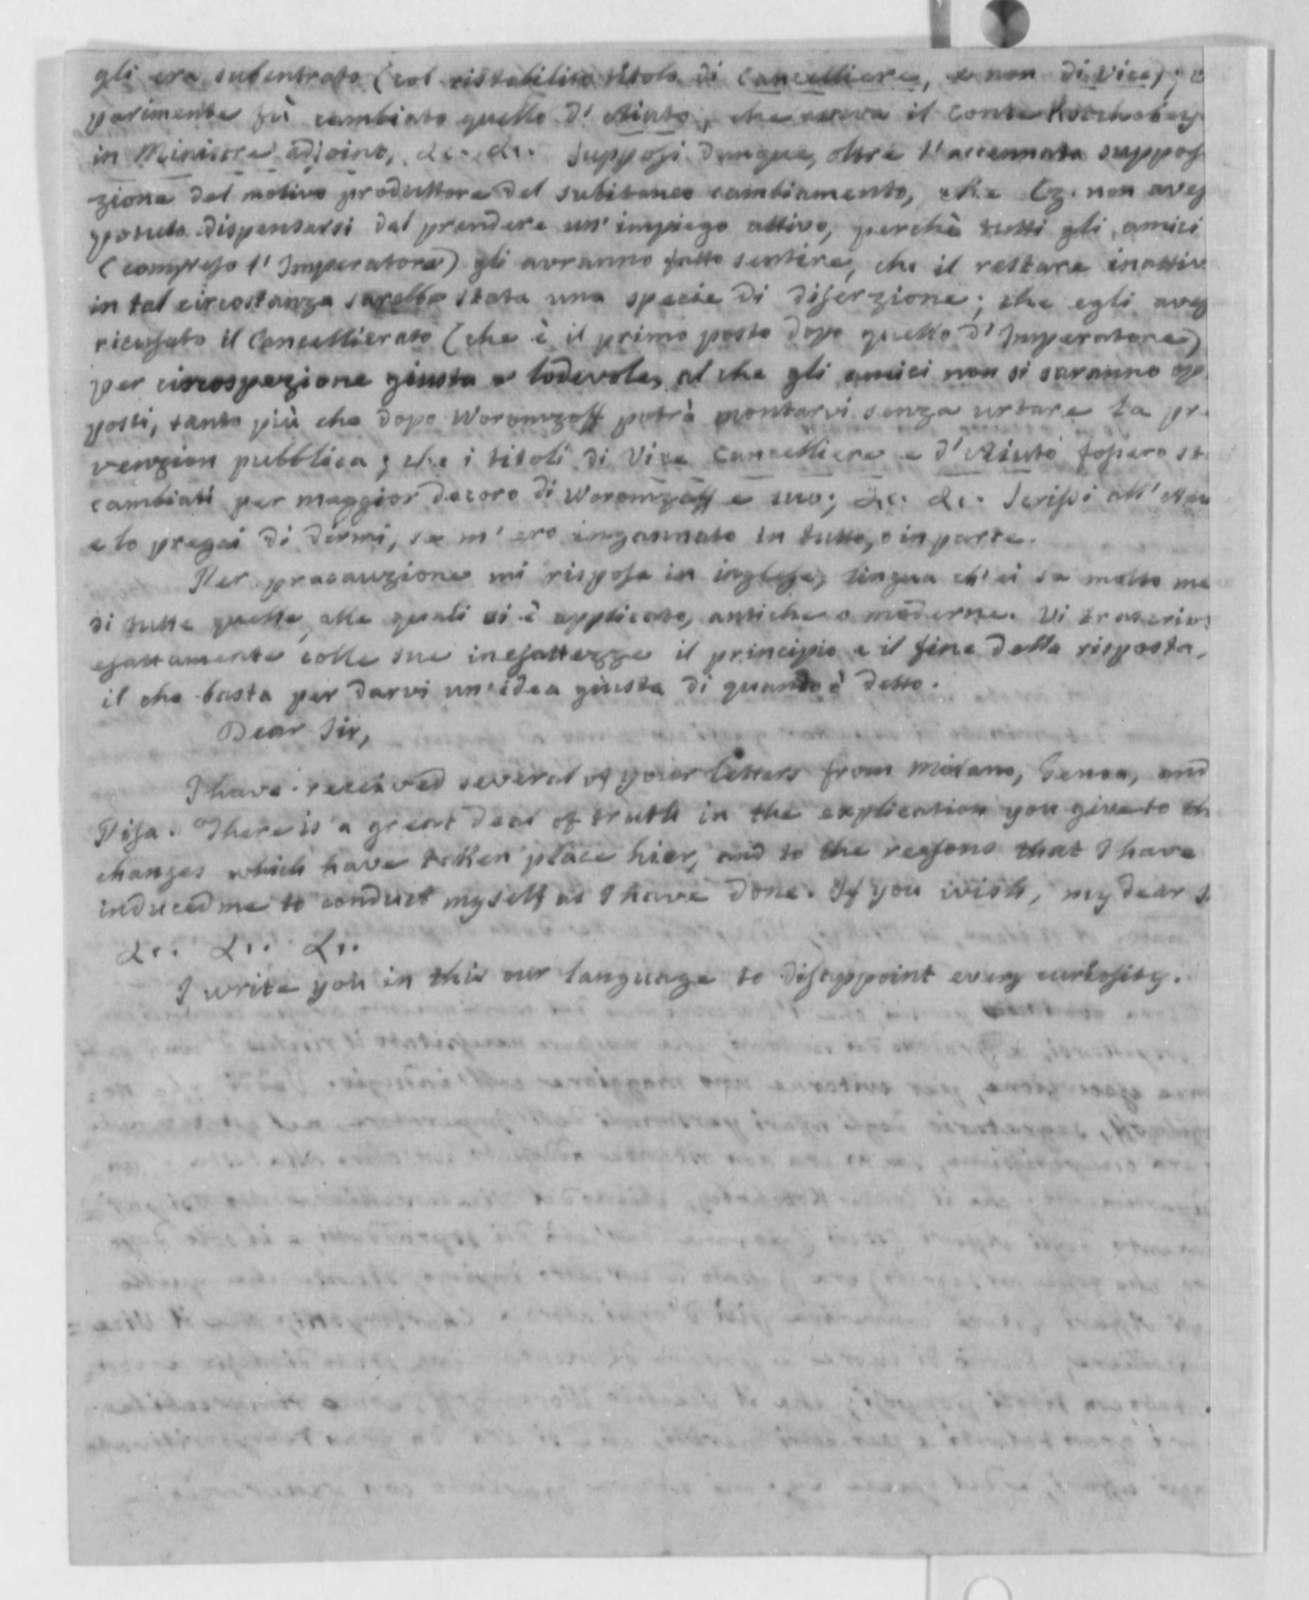 Philip Mazzei to James Madison, 1804, in Italian